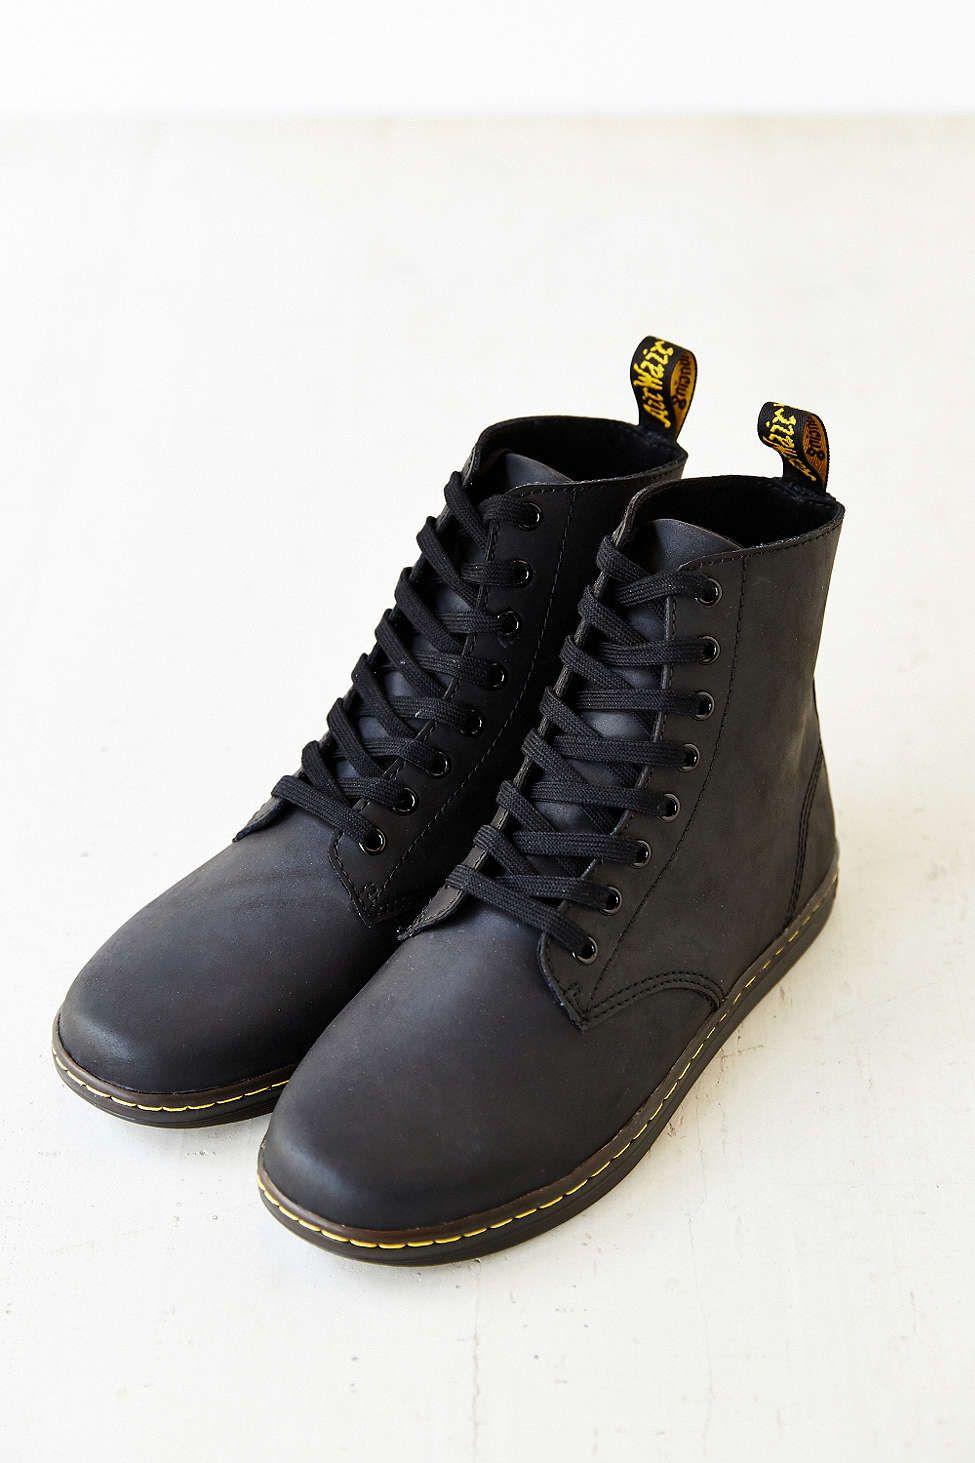 Dr. Martens Tobias 8-Eye Boot